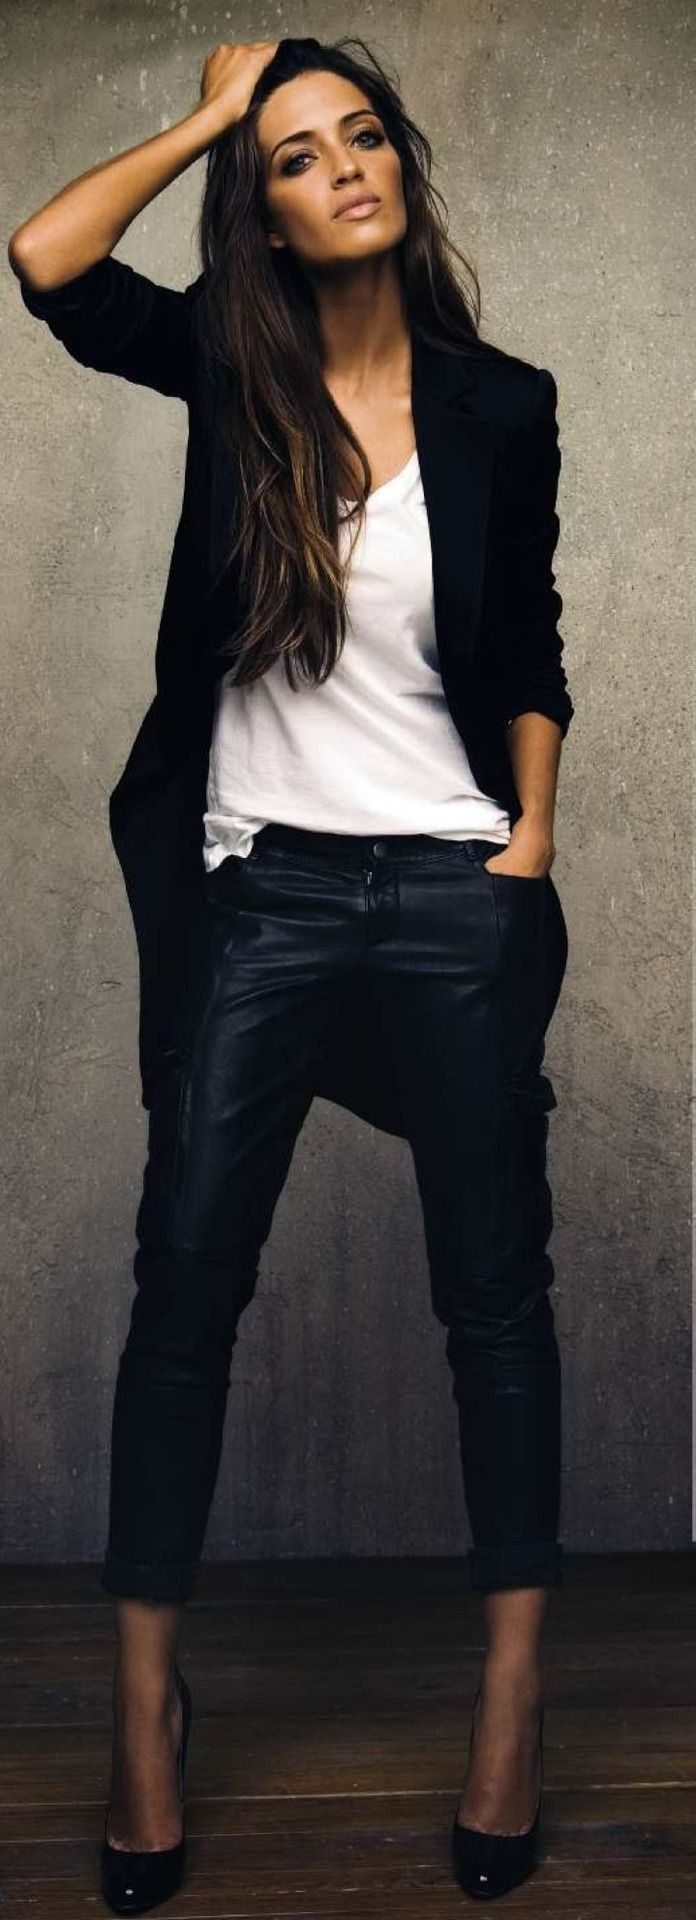 Den Look kaufen: https://lookastic.de/damenmode/wie-kombinieren/mantel-schwarzer-t-shirt-mit-rundhalsausschnitt-weisses-enge-hose-schwarze-pumps-schwarze/4395 — Schwarzer Mantel — Weißes T-Shirt mit Rundhalsausschnitt — Schwarze Enge Hose aus Leder — Schwarze Leder Pumps